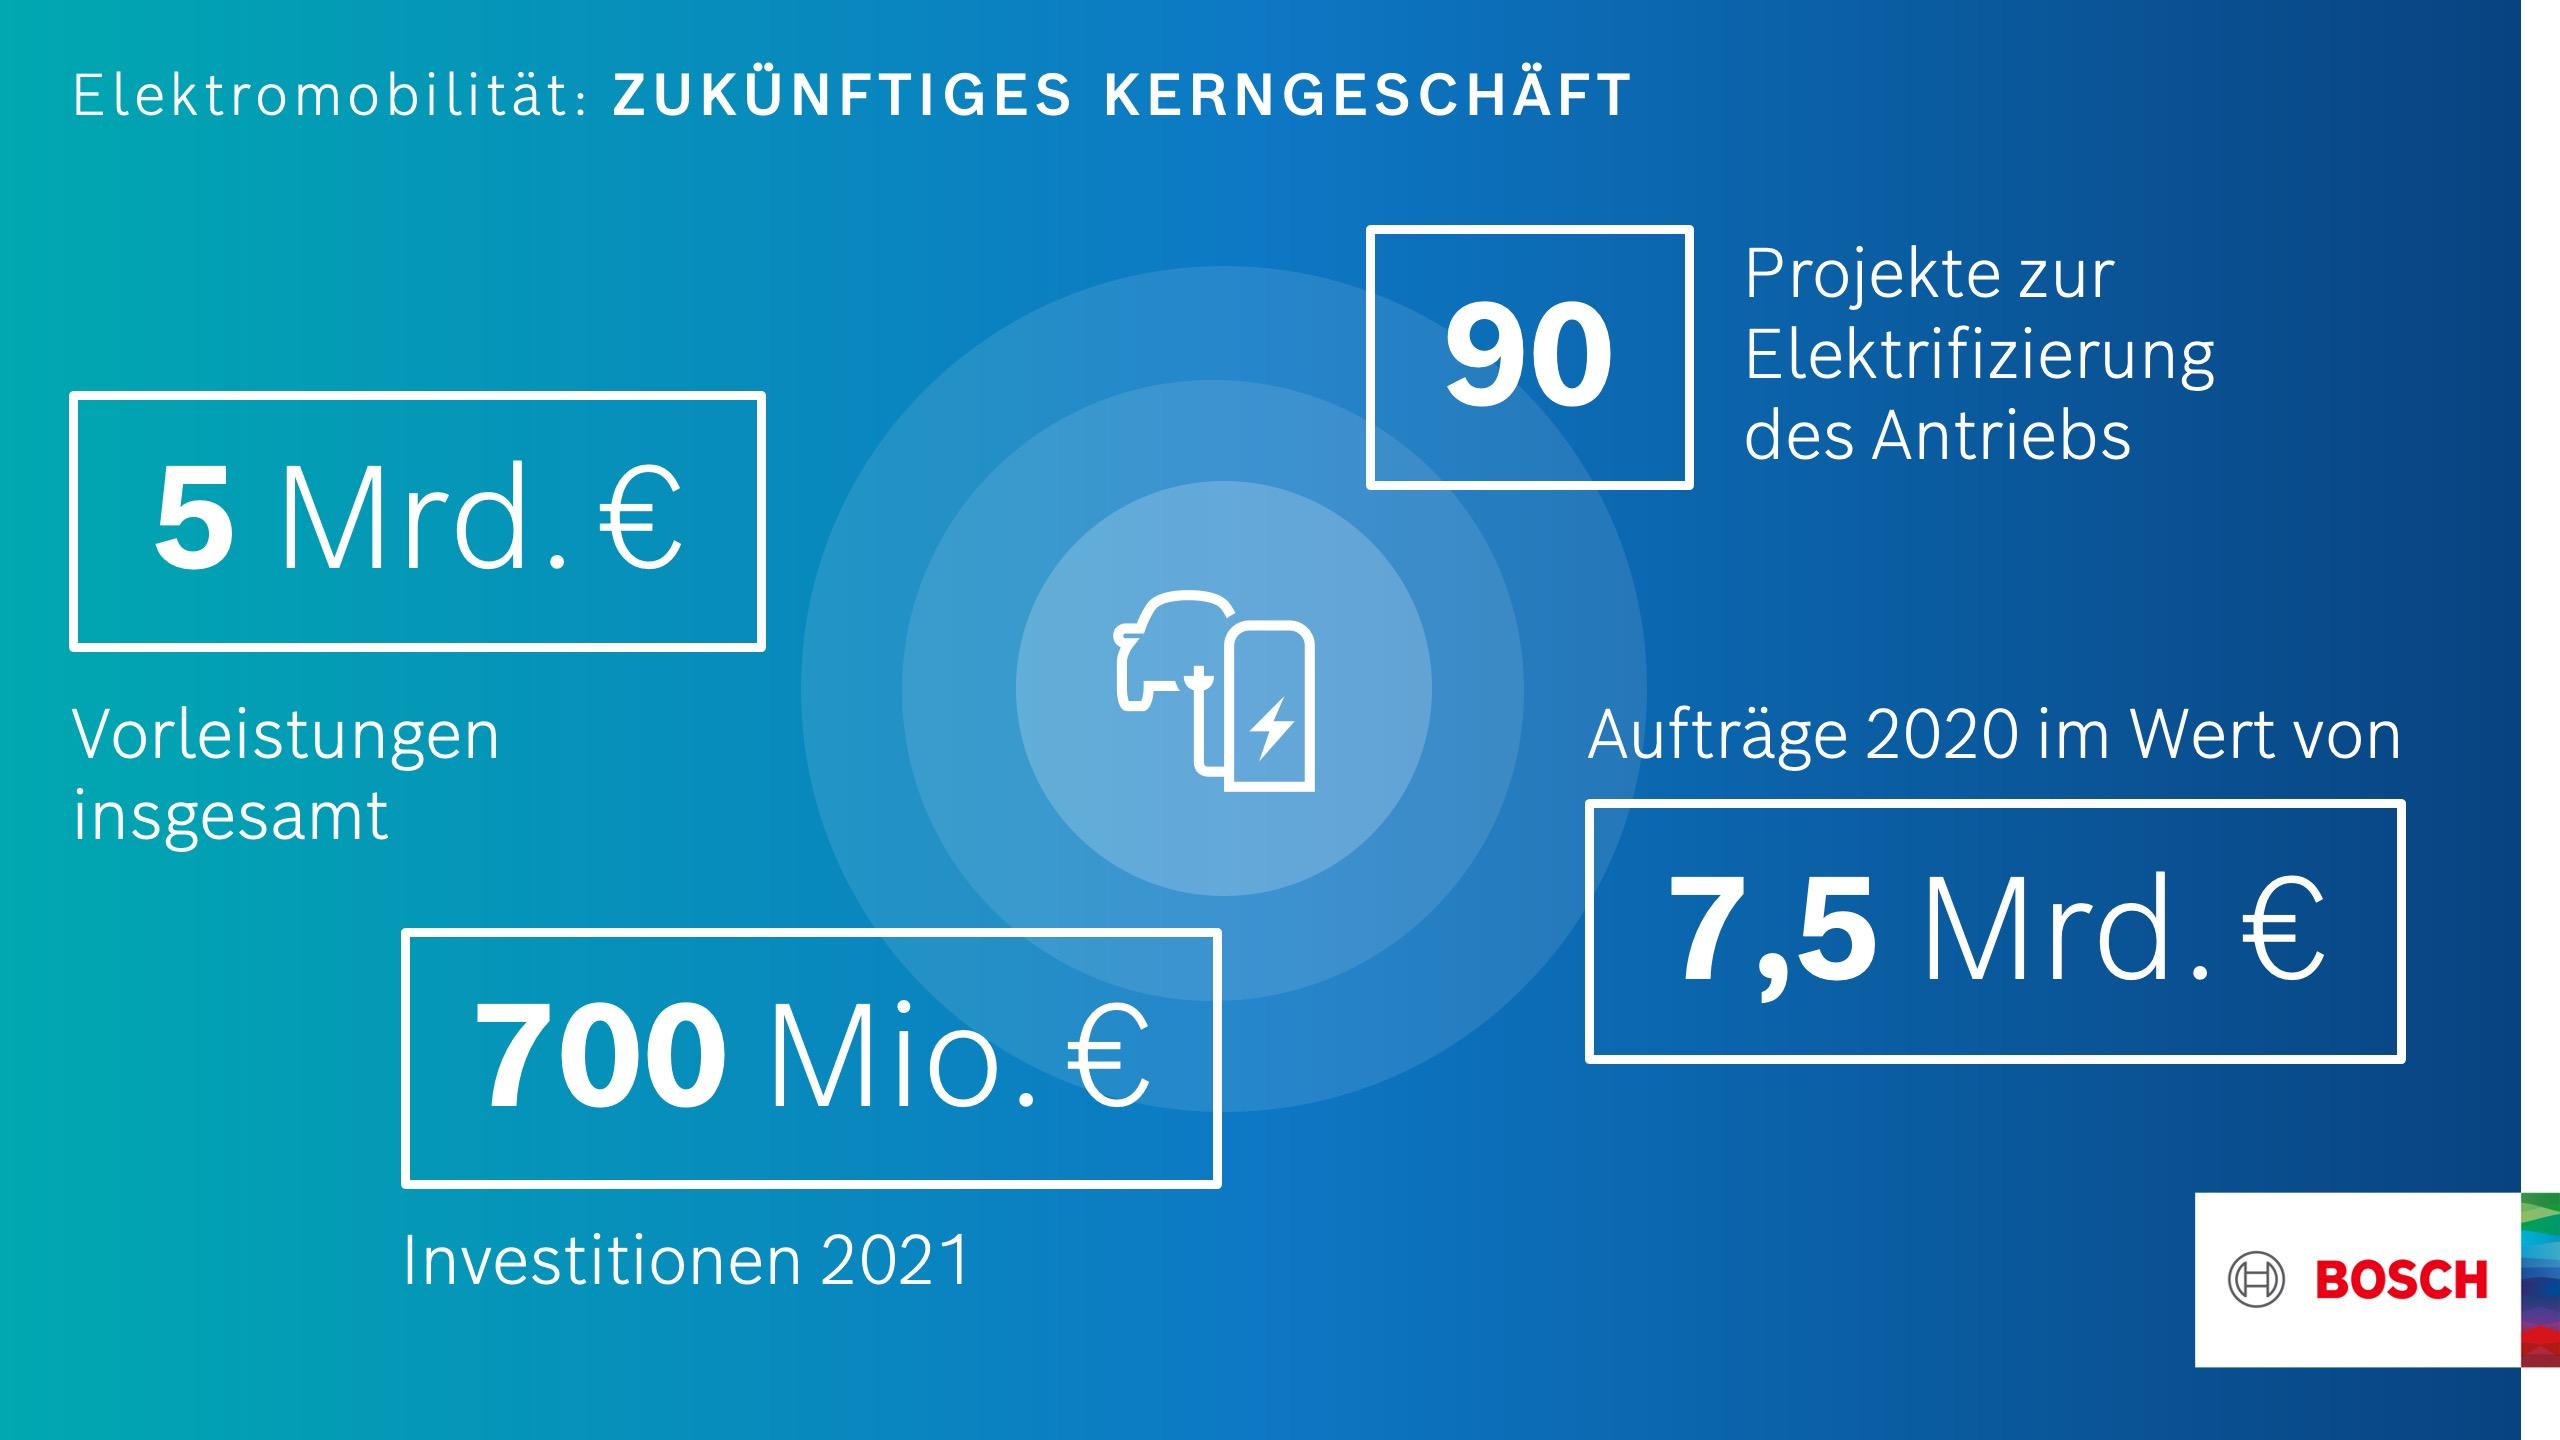 Bosch: Elektromobilität als künftiges Kerngeschäft